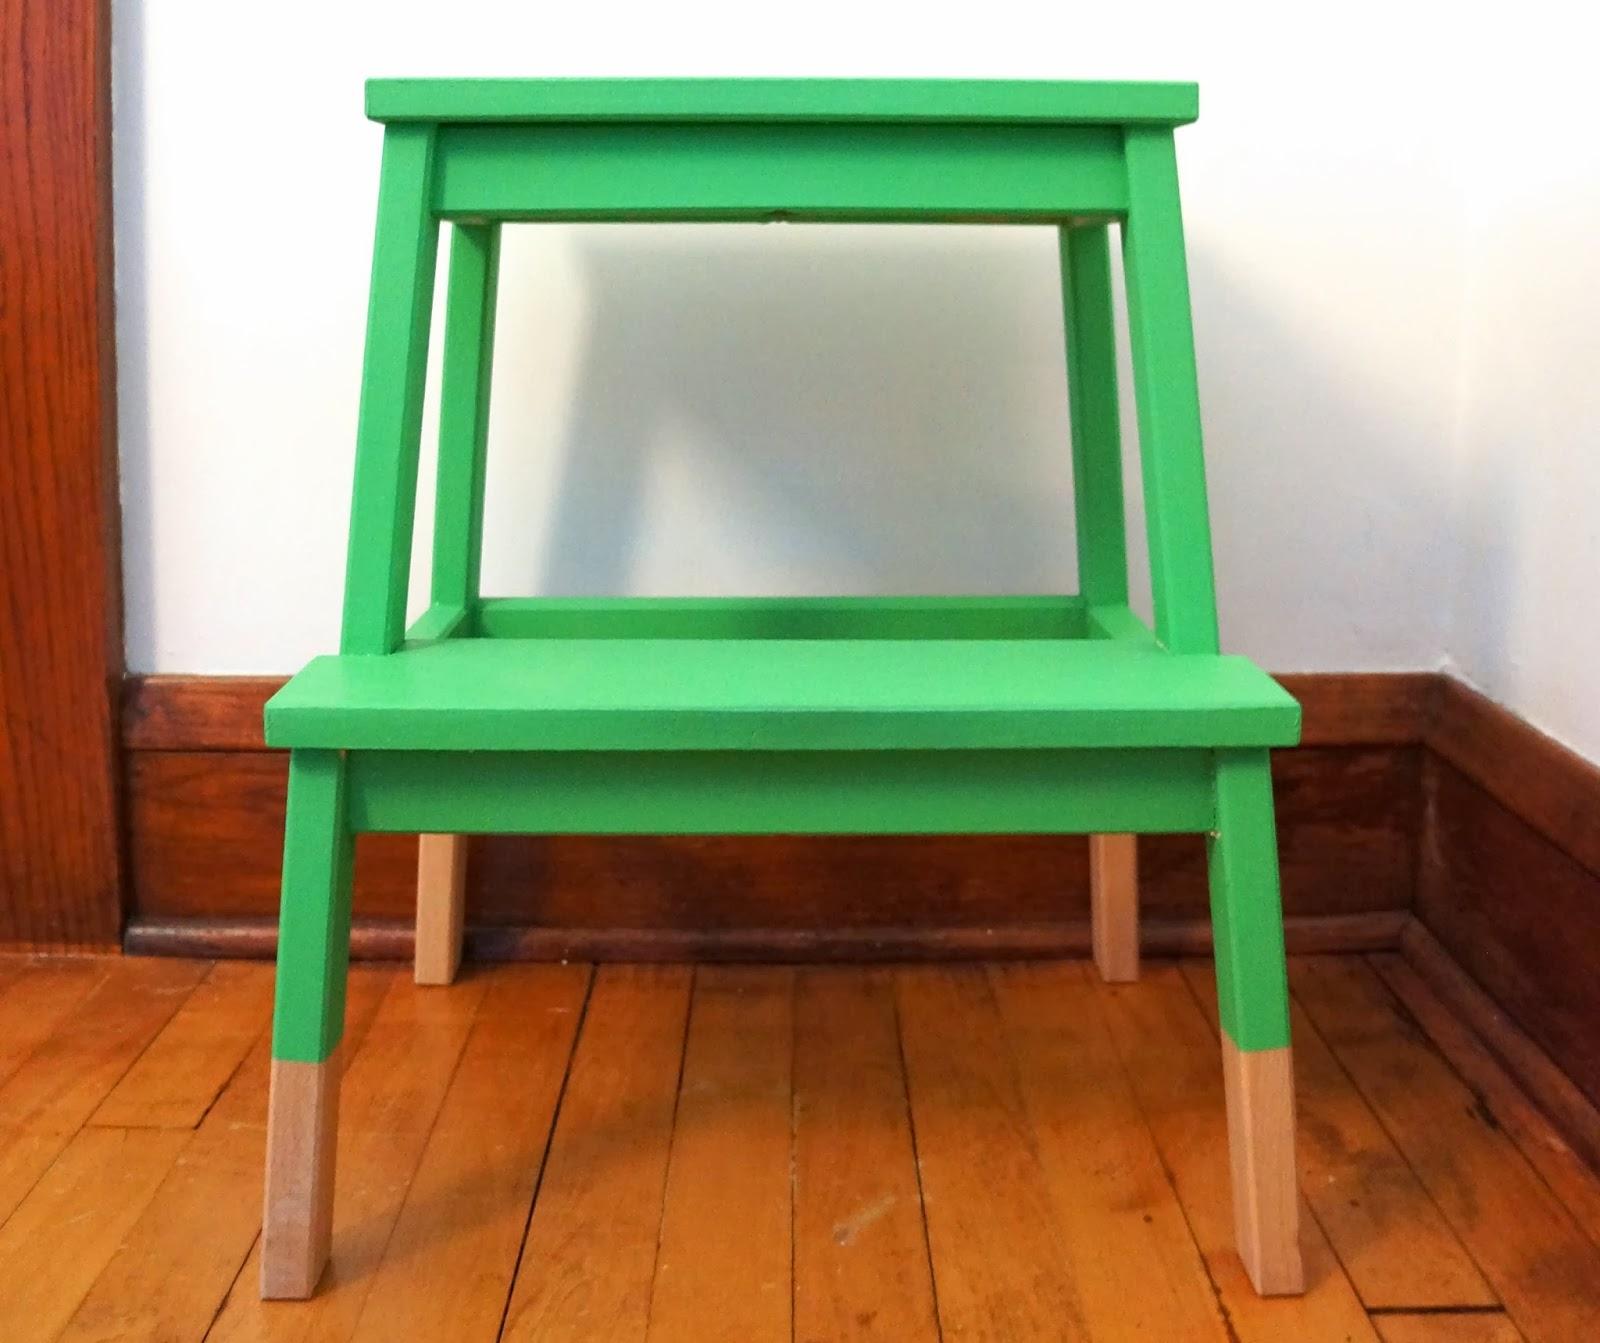 oakland avenue laura wifler diy dipped ikea bekvam step stool hack